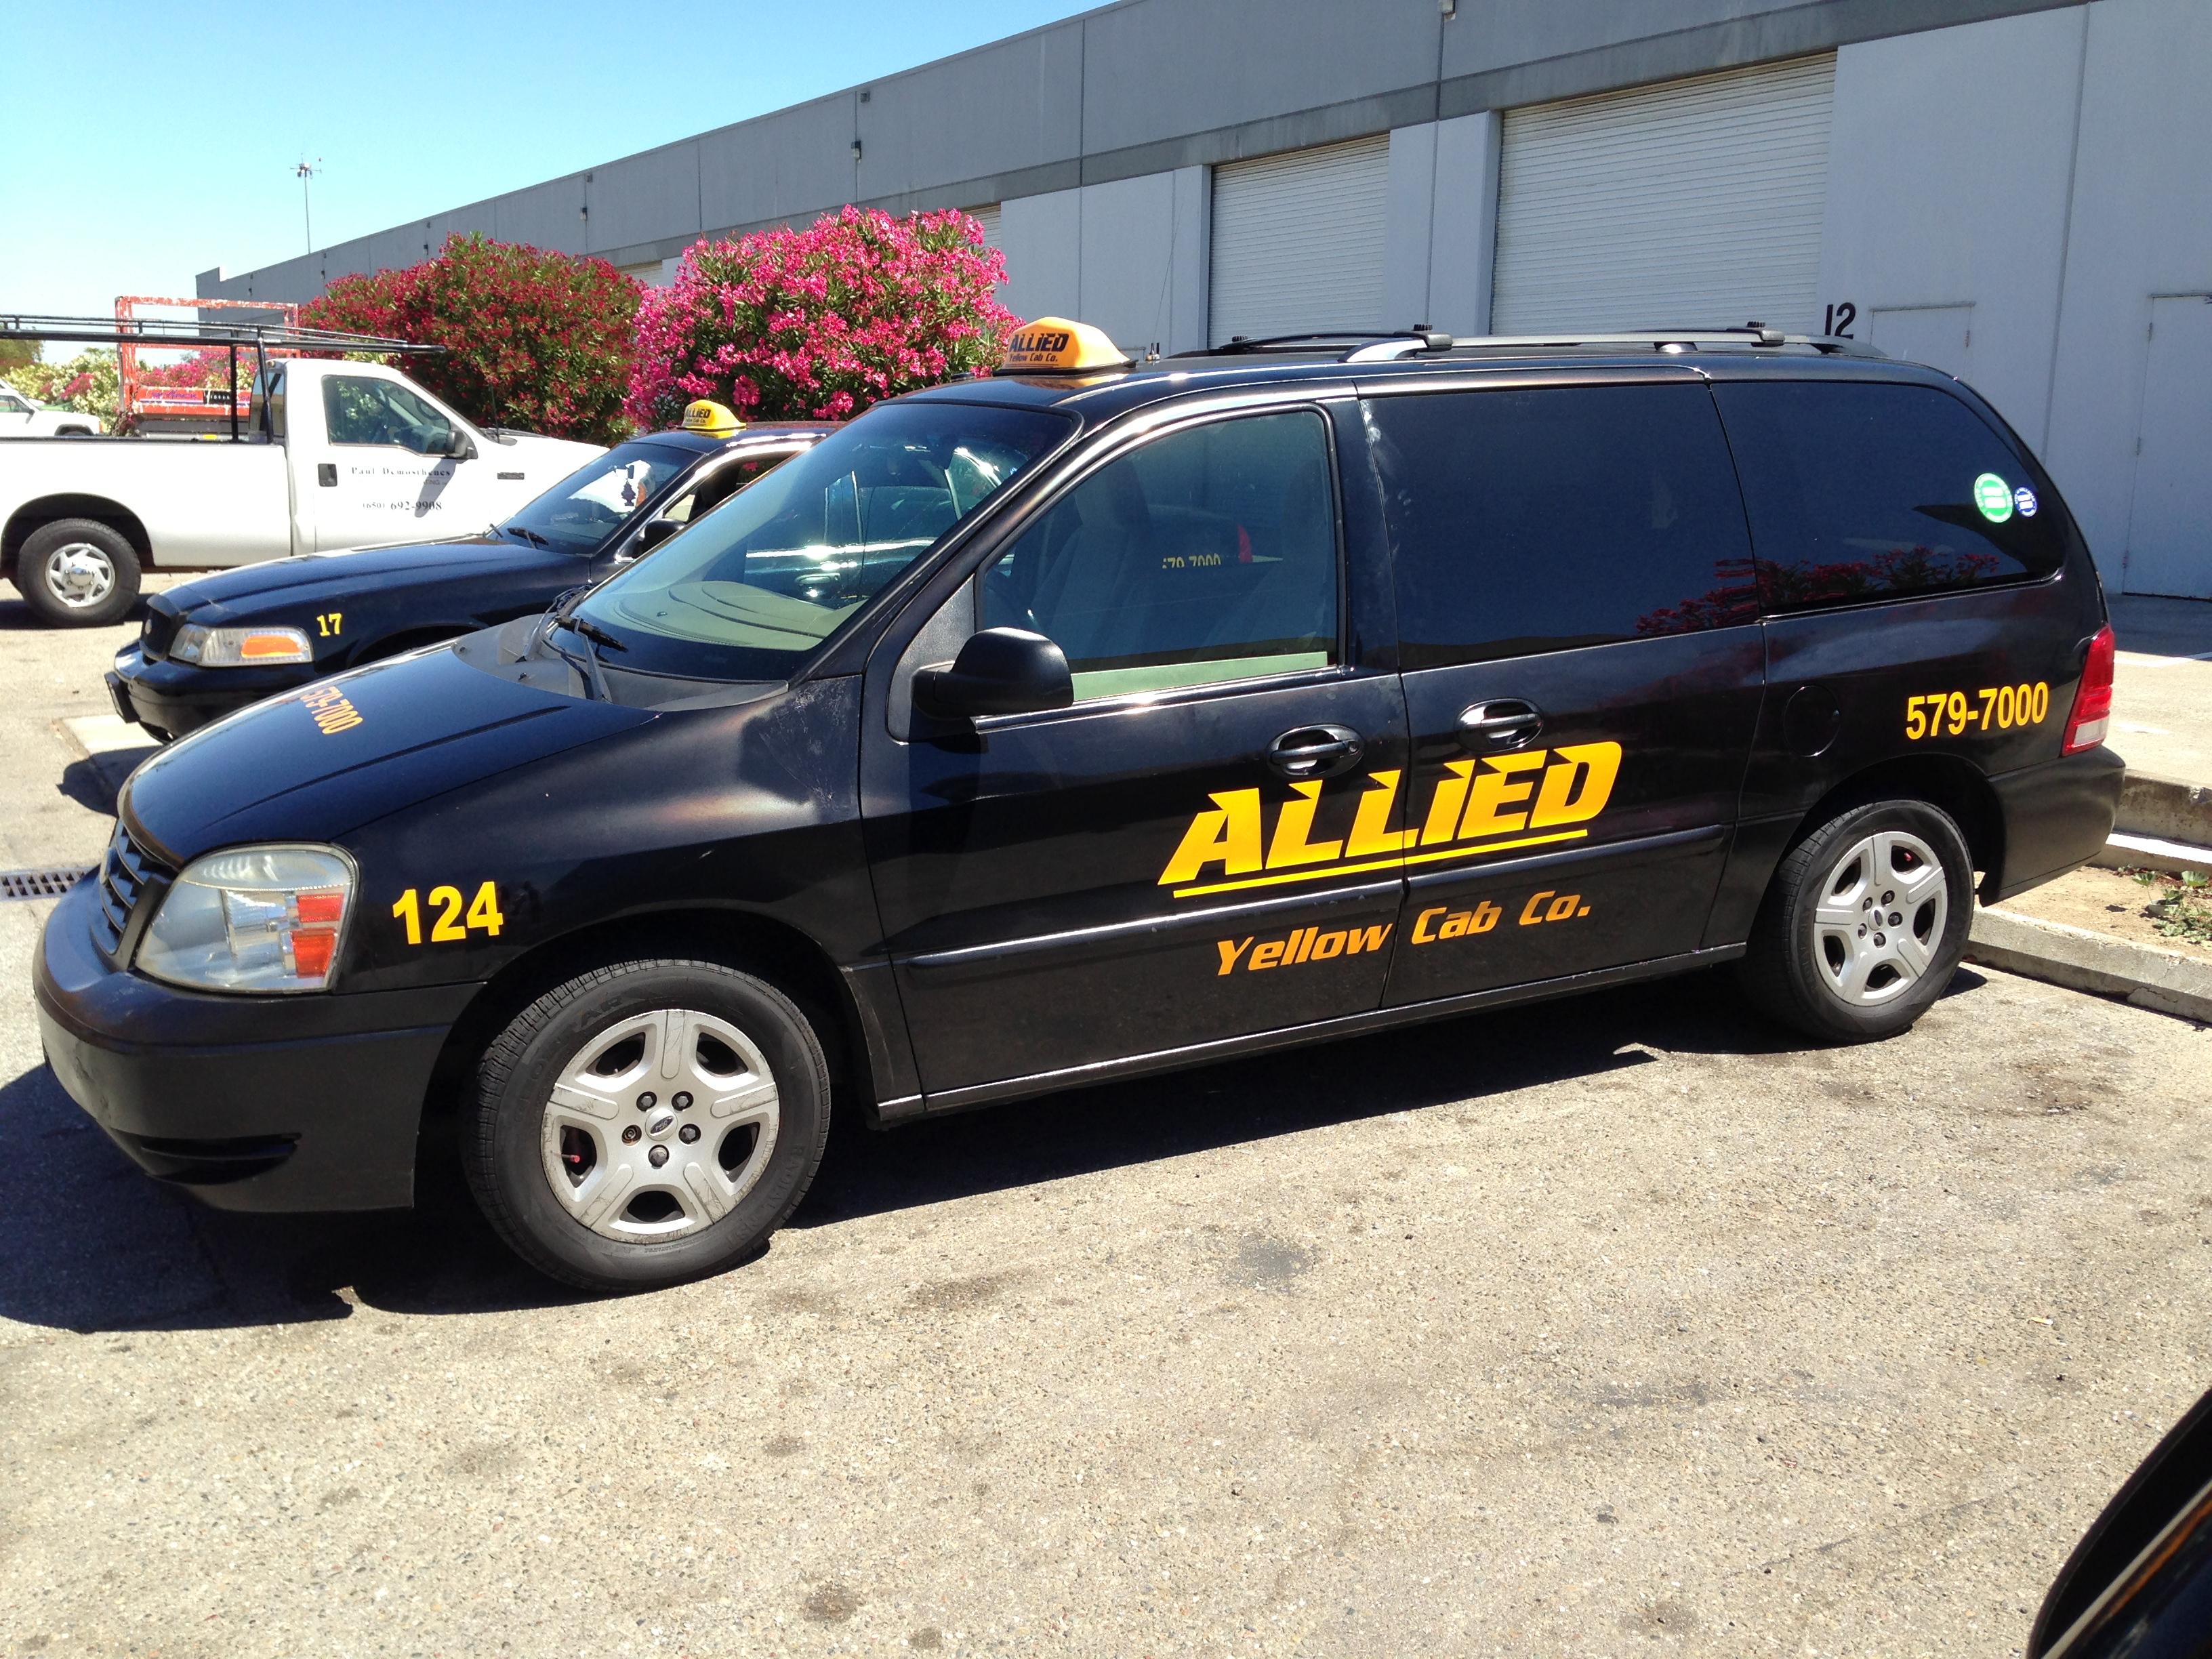 Yellow Allied Cab PO Box 1629, Burlingame, CA 94011 - YP com